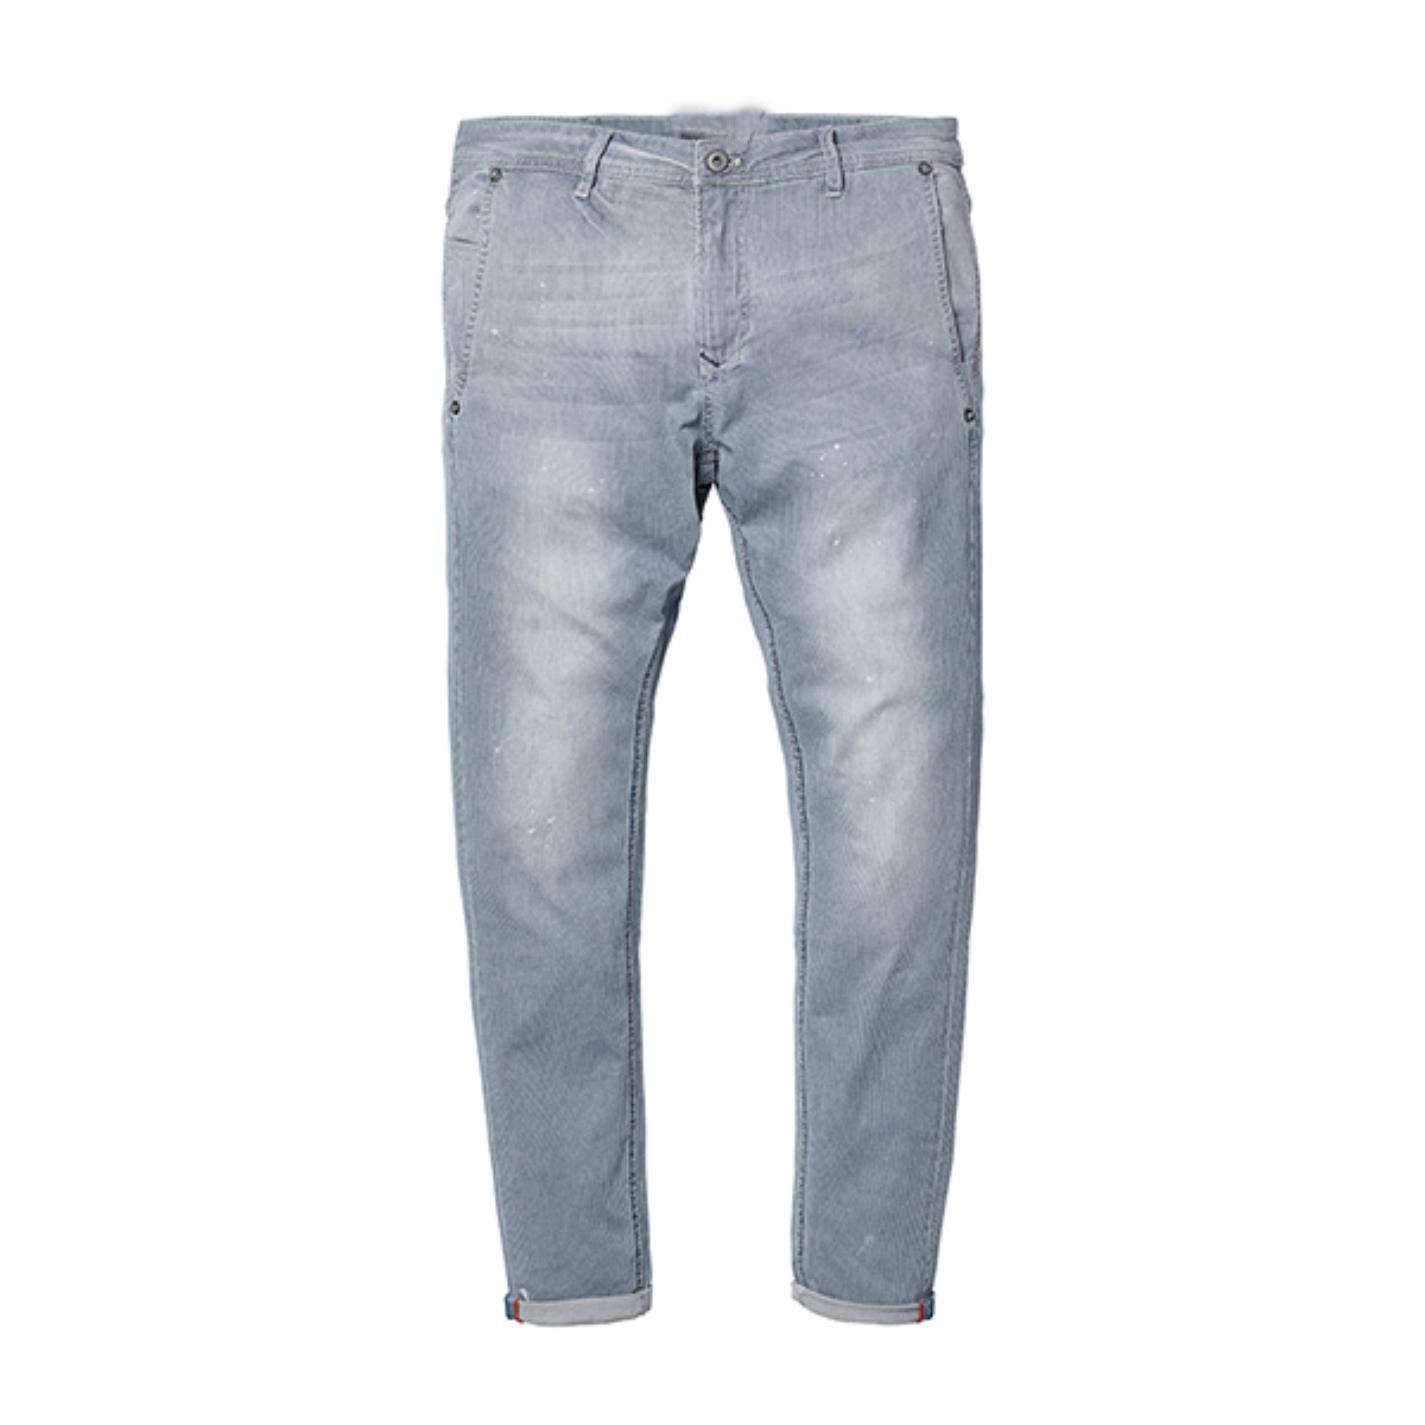 kjPmgDxK Striped Jeans Men Skinny Thin Fashion Slim Fit Denim